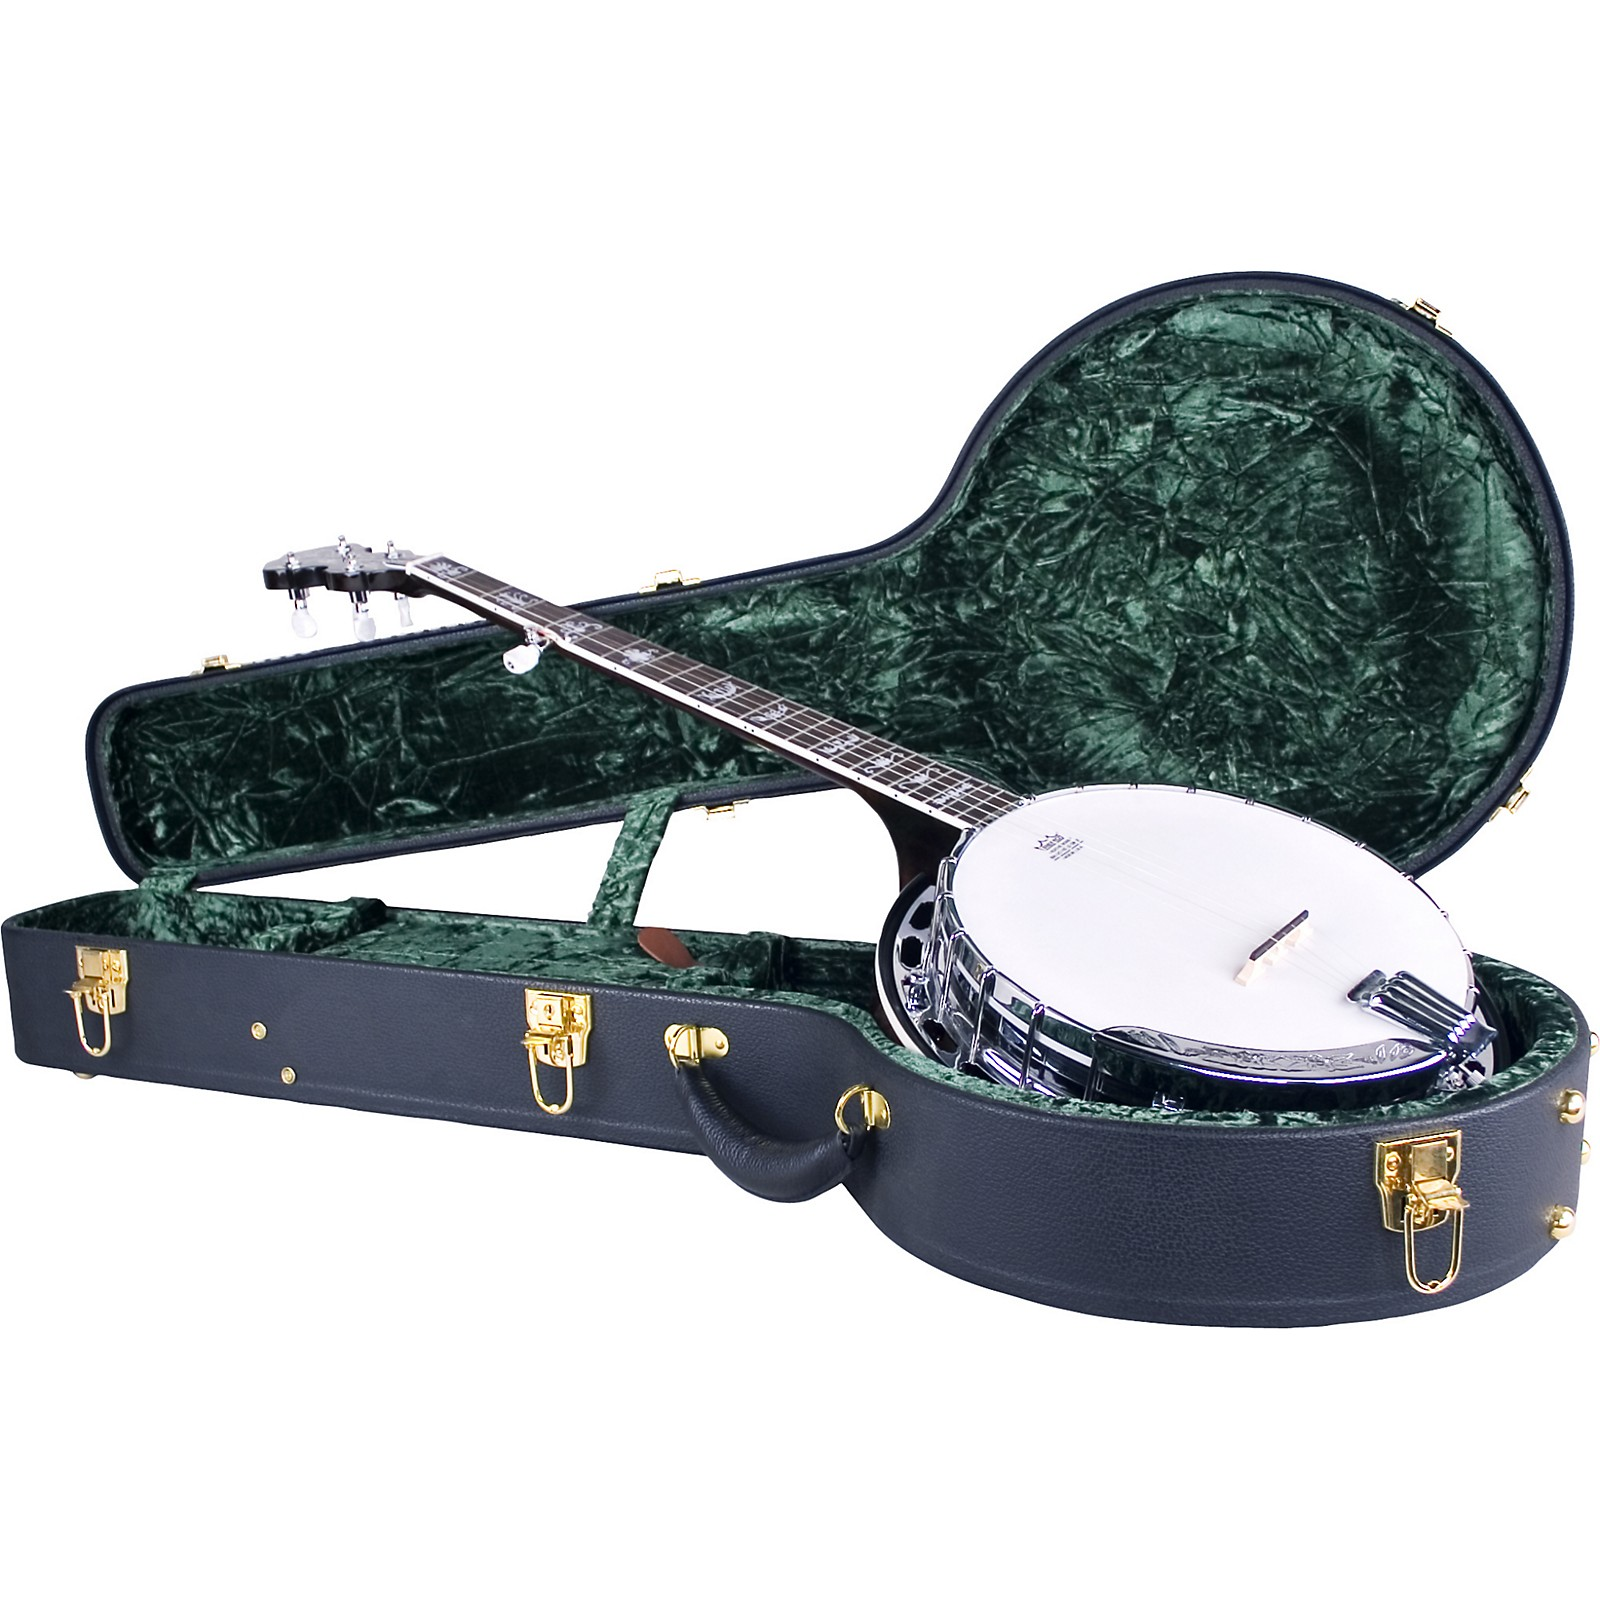 Silver Creek Vintage Archtop Case for Banjo